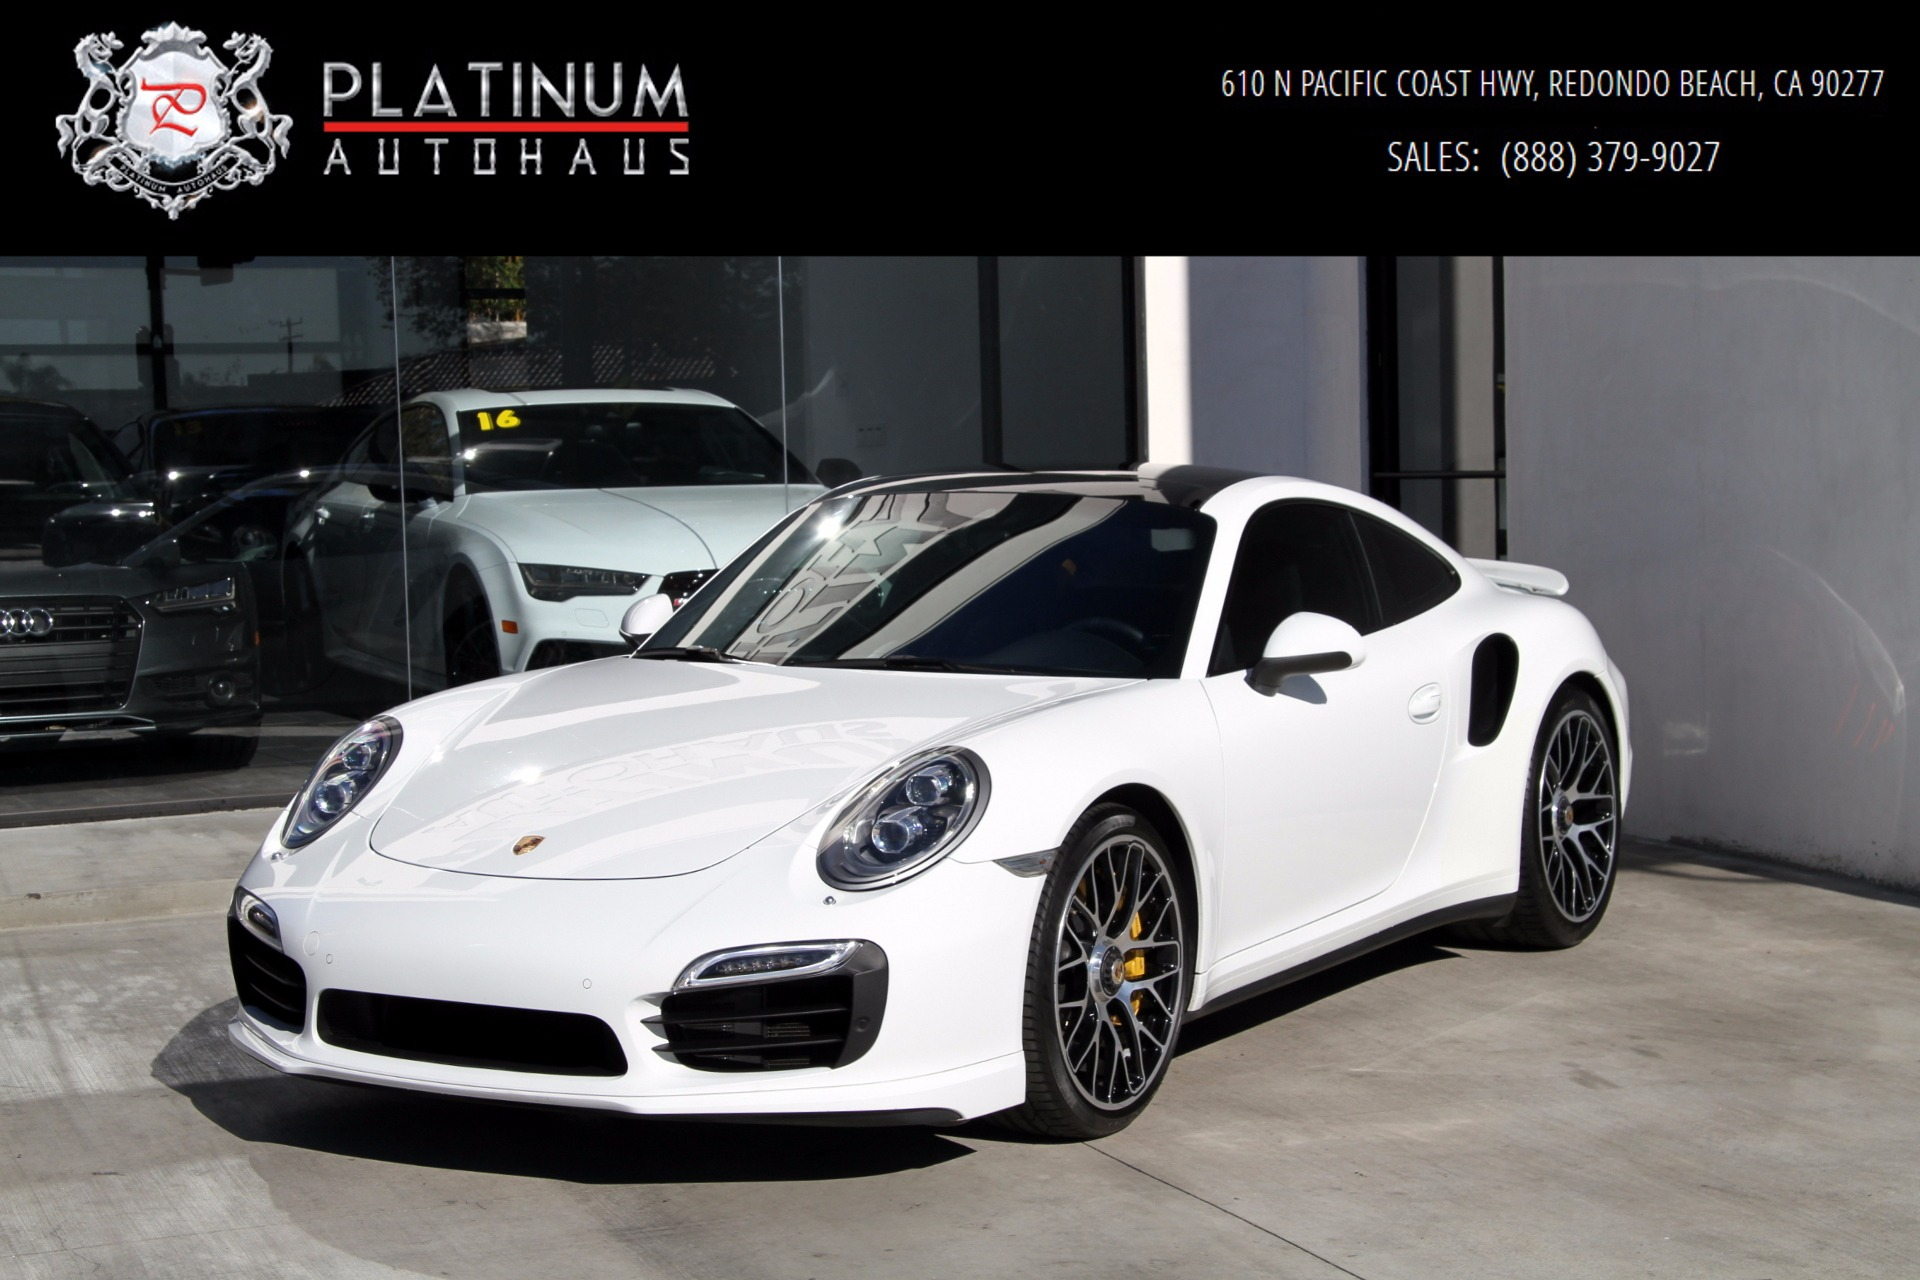 2014 Porsche 911 Turbo S ** MSRP $188,095 ** Stock # 6044 for sale